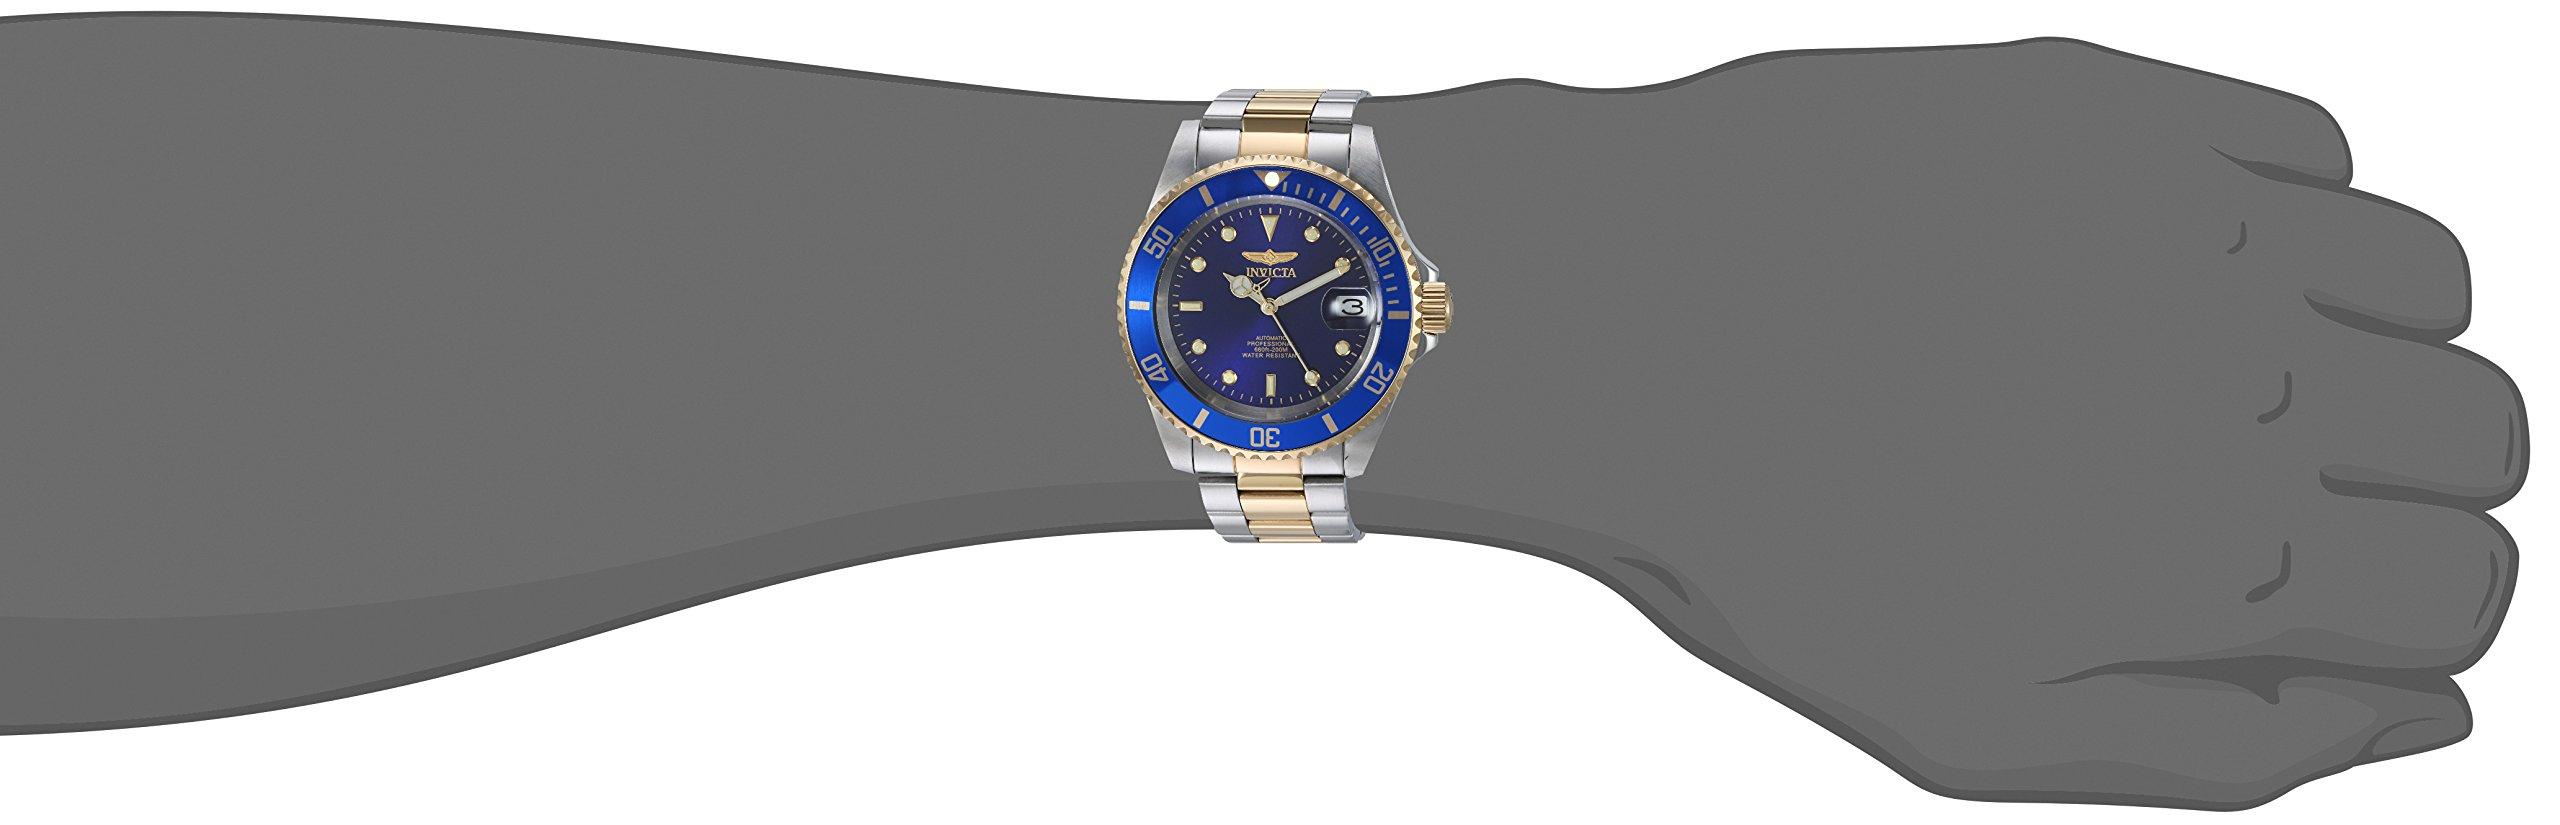 3d4b2b87808 Amazon.com  Invicta Watches